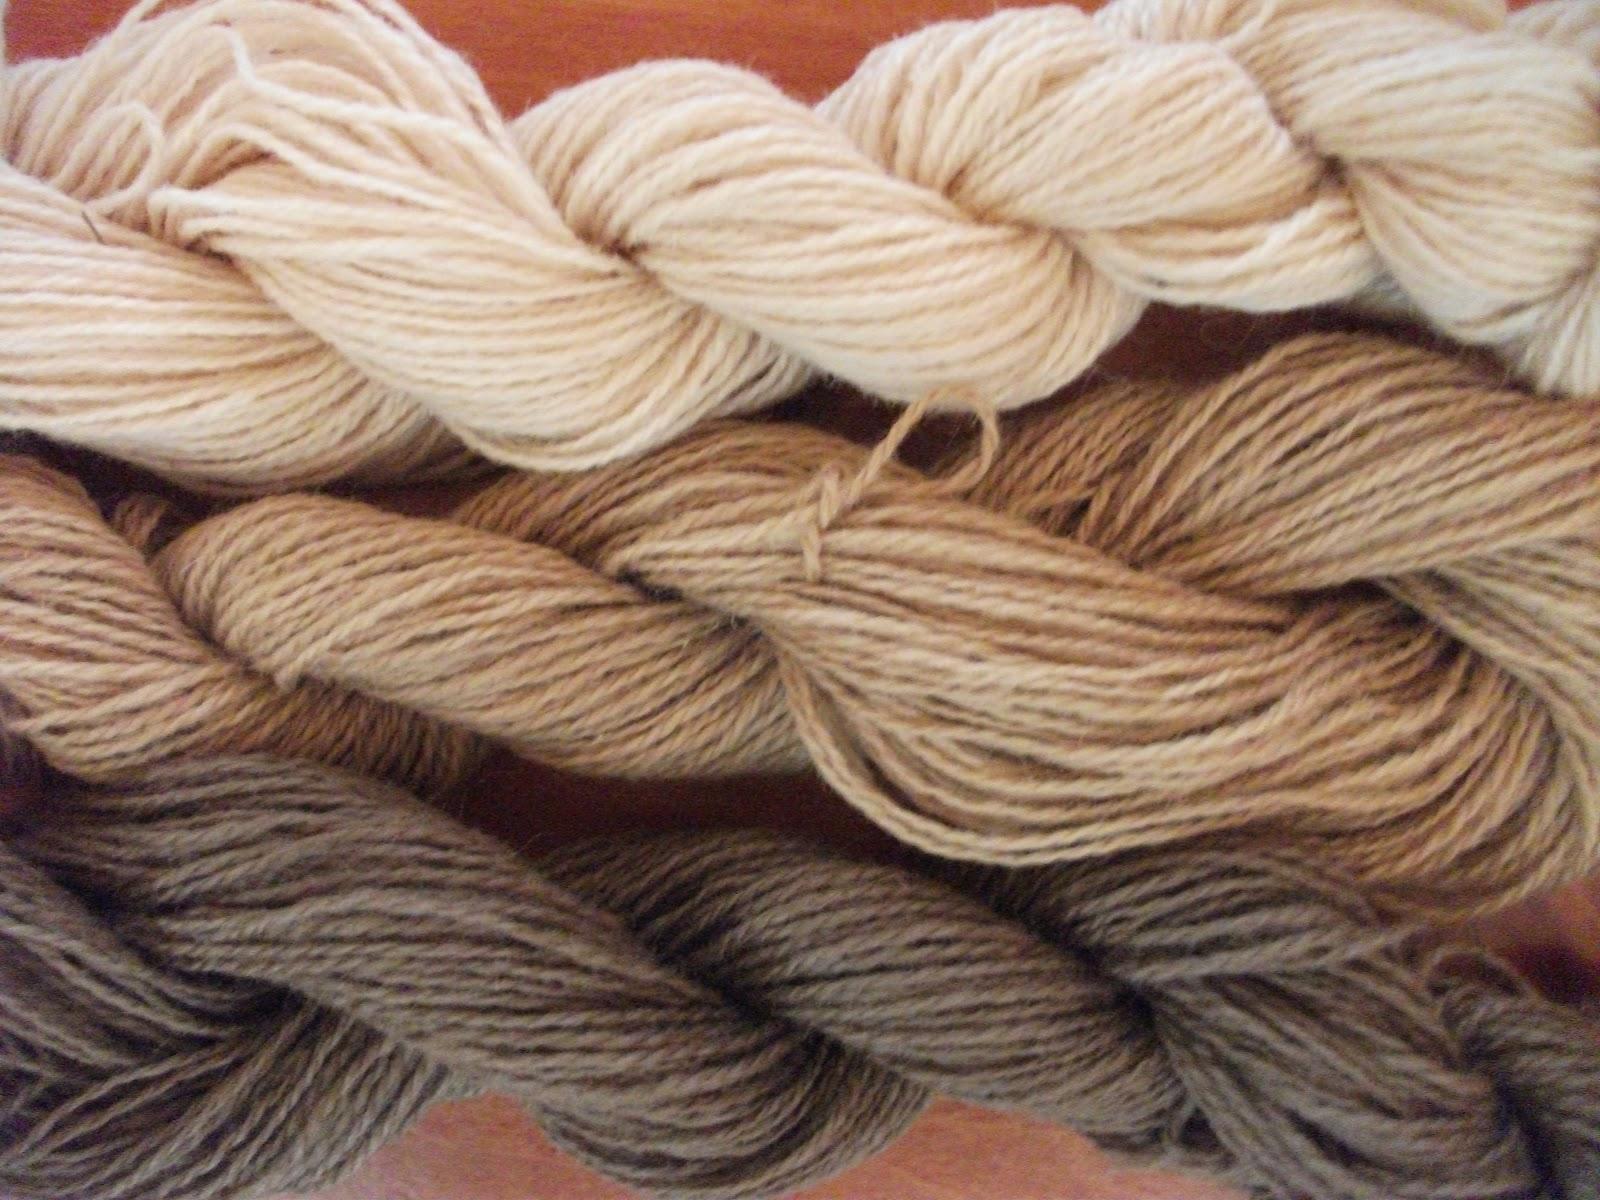 wool fiber 40 merino wool colors, $249/oz, 44 nz corriedale roving colors, $249, 25 homespun colors, $175, pencil roving, core fiber.